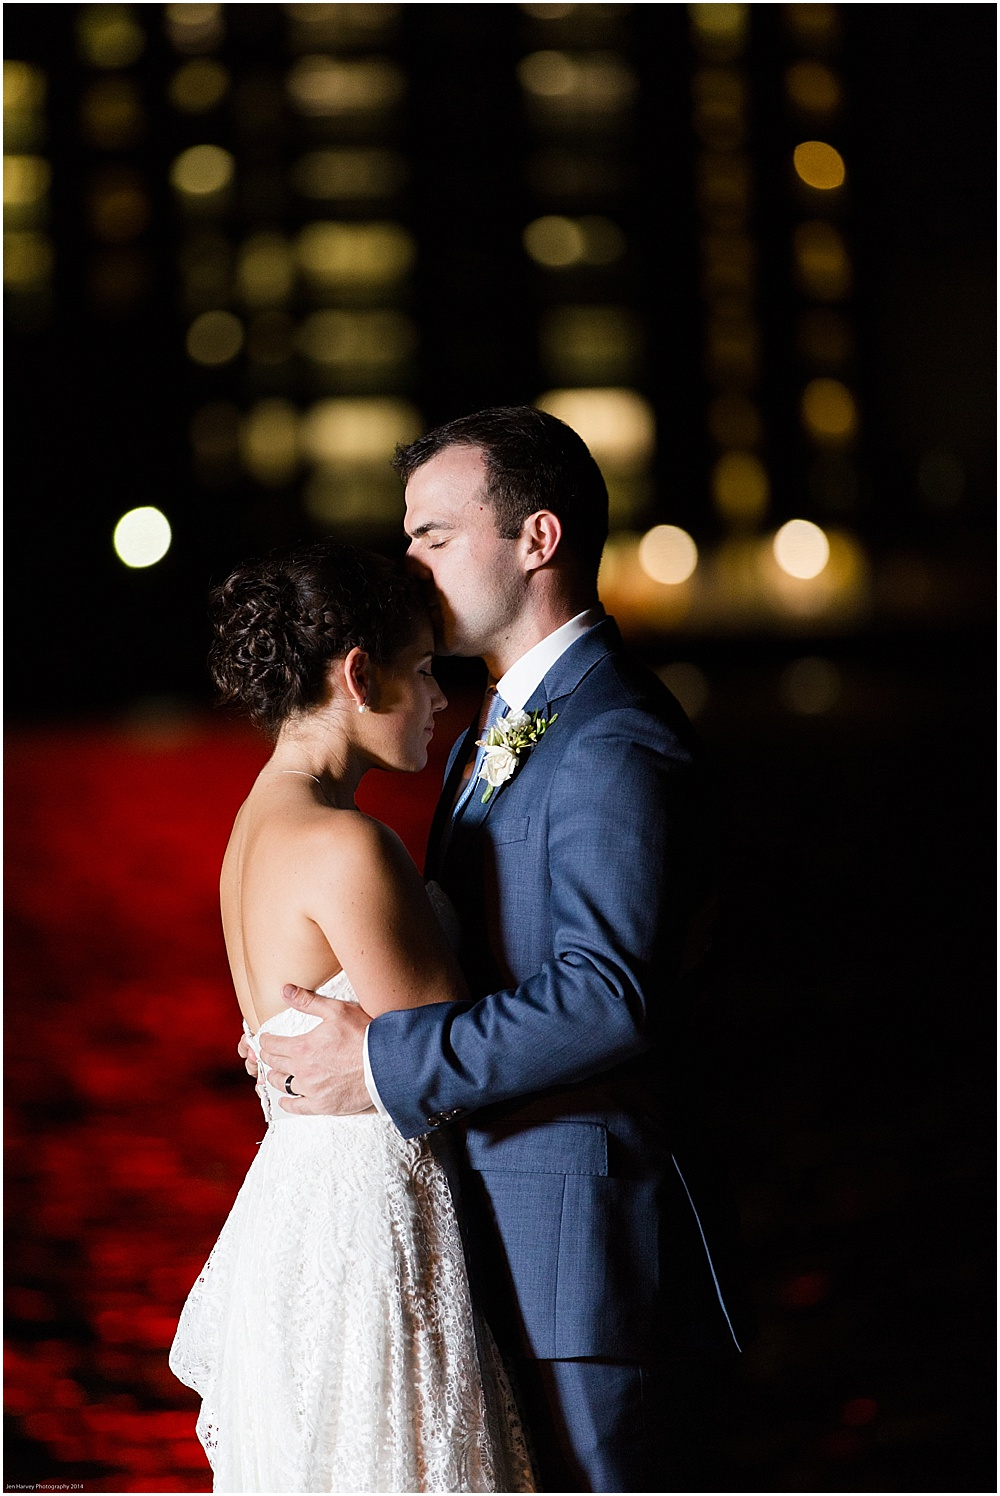 liz_robert_fredick_douglas_martime_museum_baltimore_wedding_photographer_0006